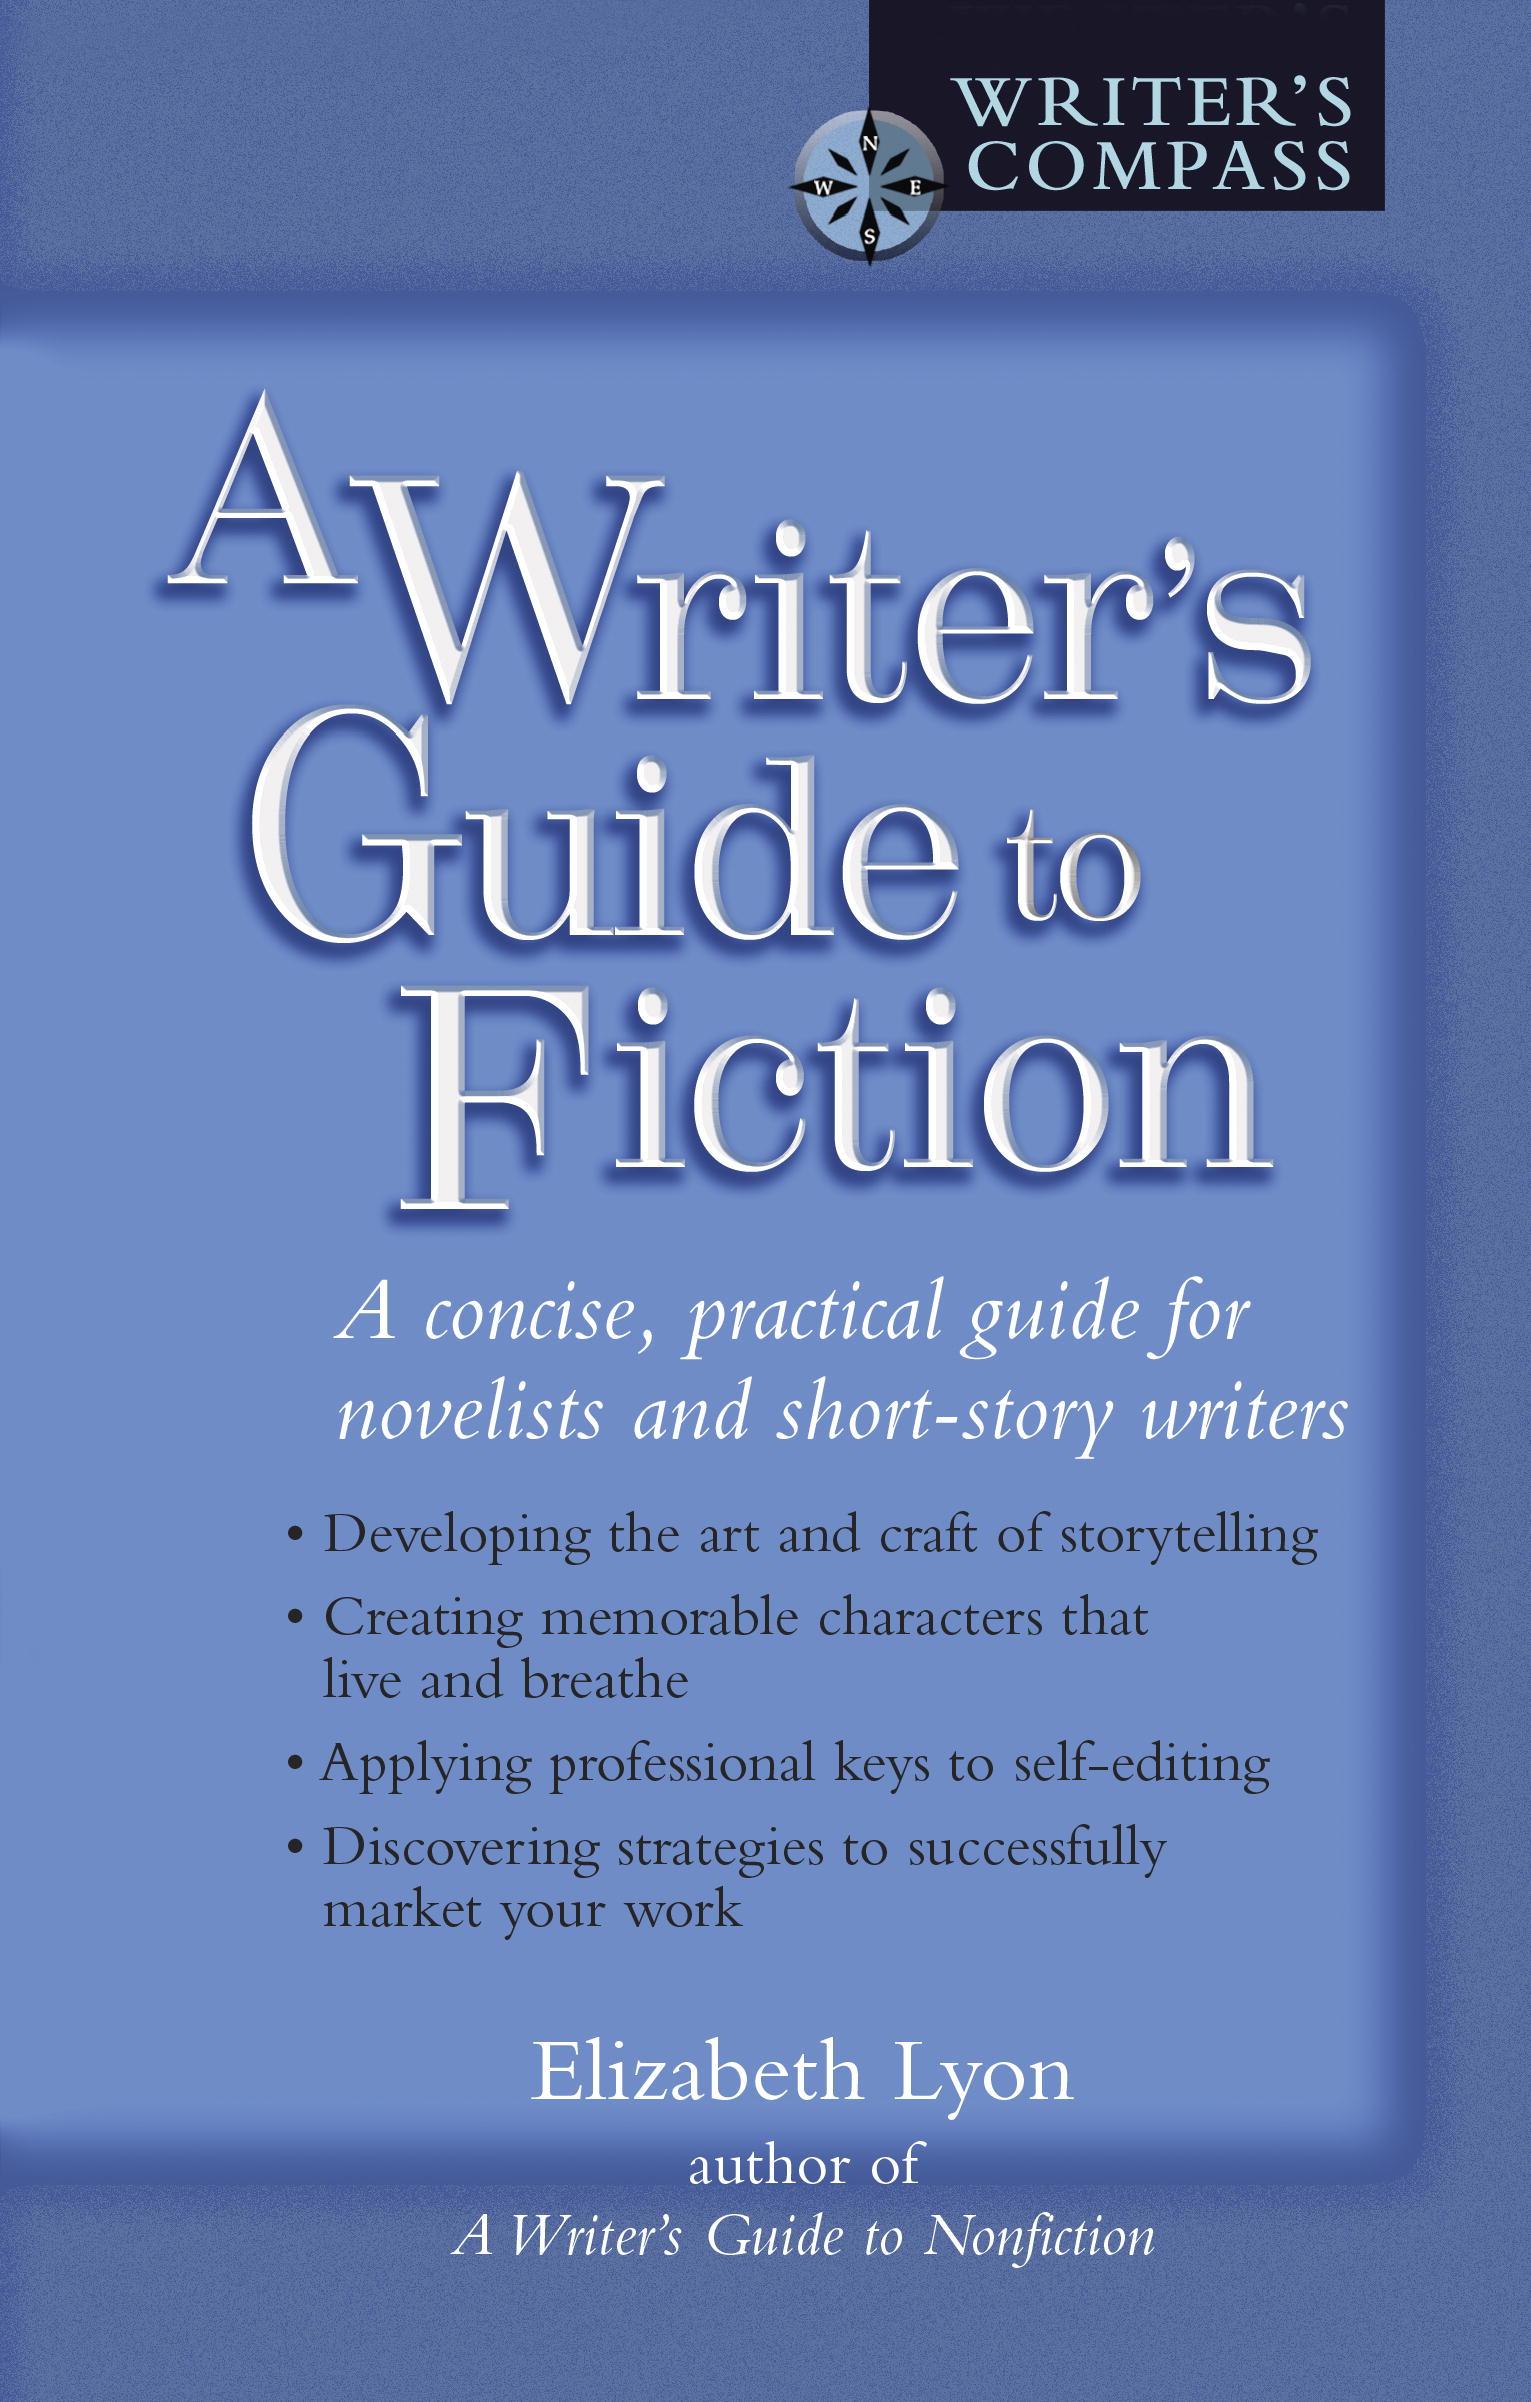 Download Ebook A Writer's Guide to Fiction by Elizabeth Lyon Pdf